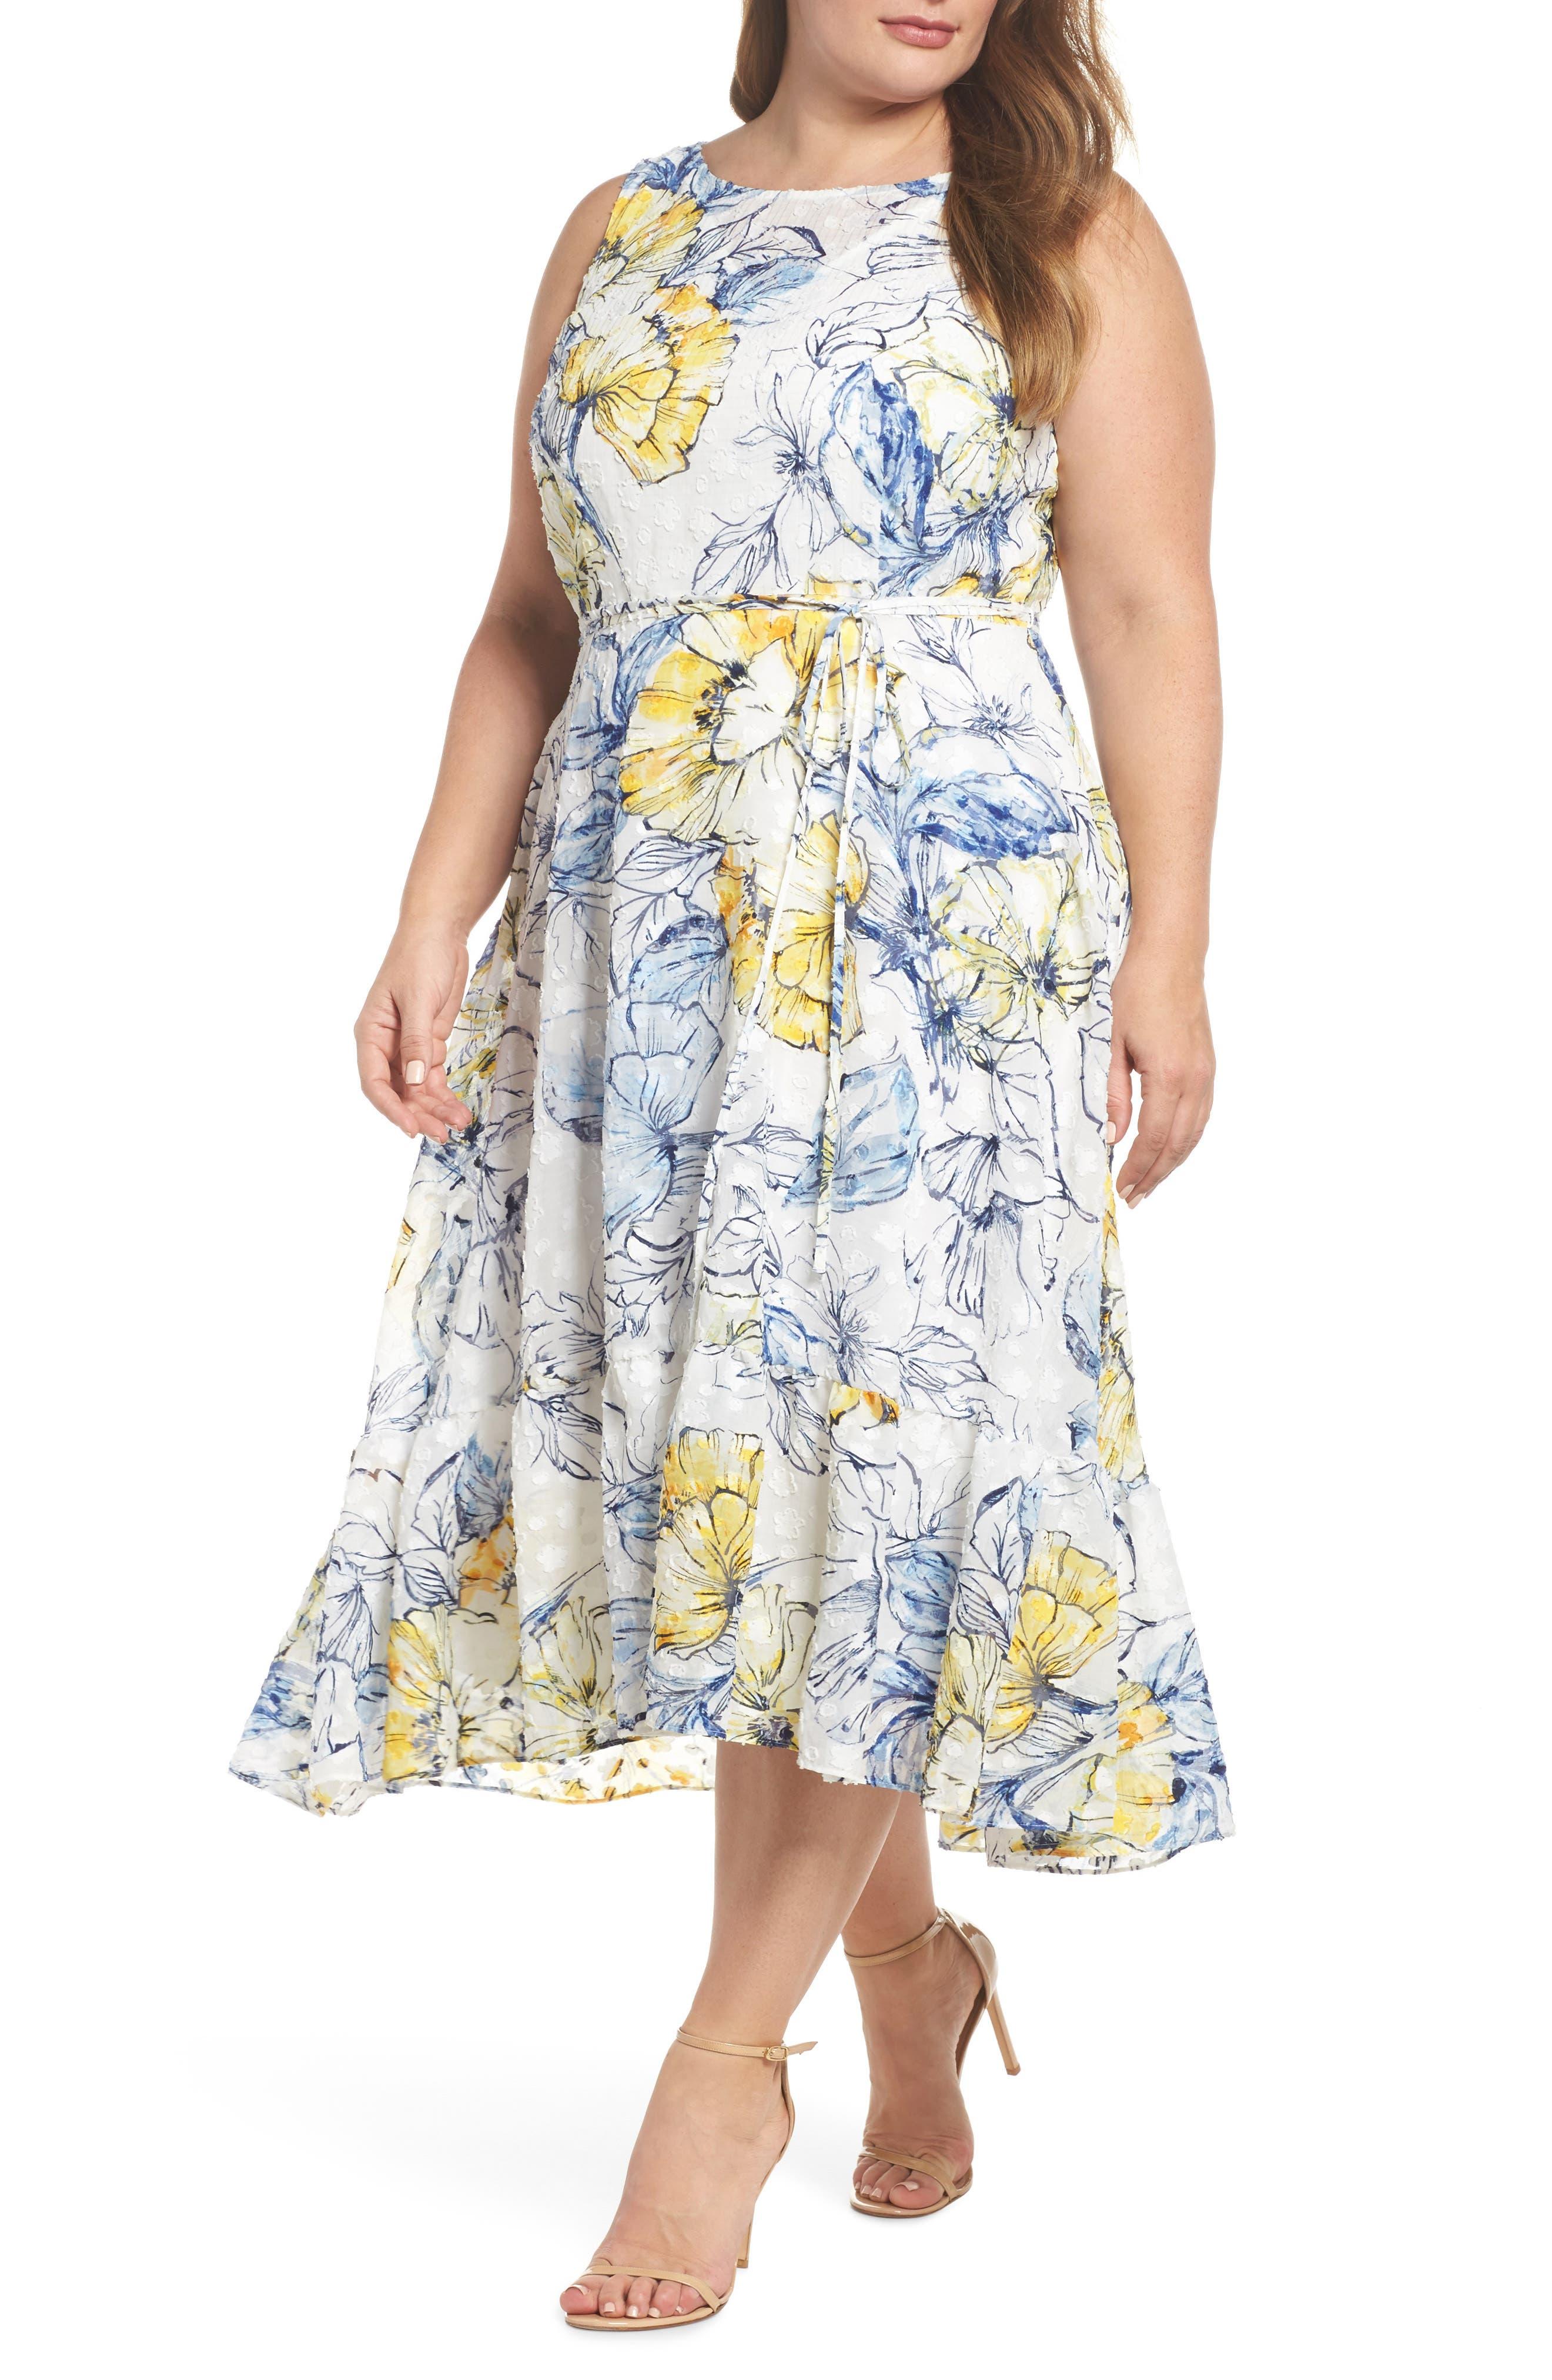 Gabby skye plus size twill floral shift dress